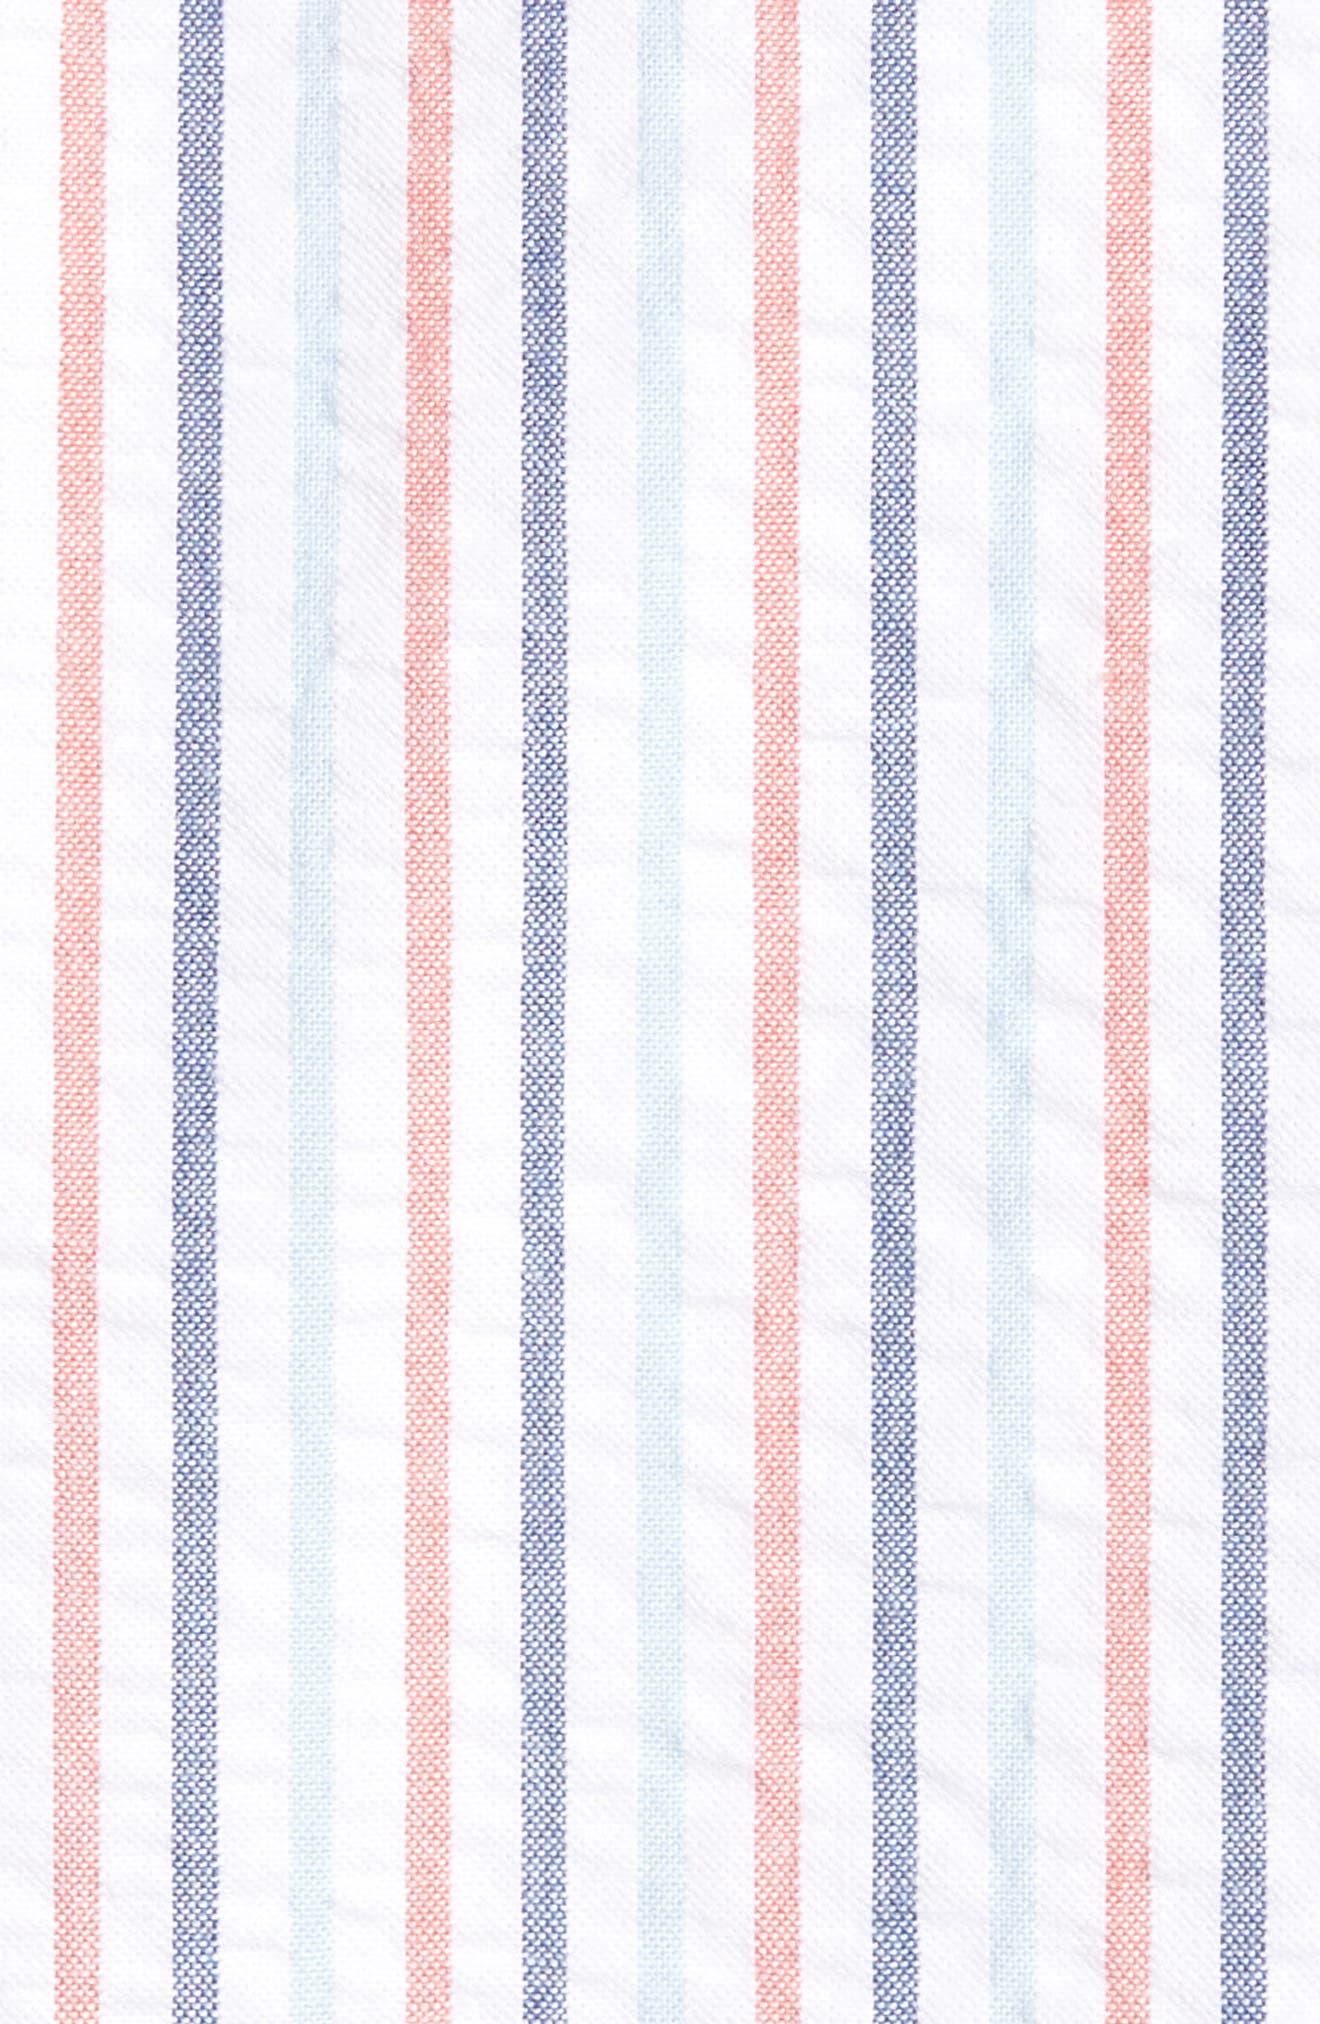 Trim Fit Seersucker Short Sleeve Sport Shirt,                             Alternate thumbnail 5, color,                             White Multi Pencil Stripe